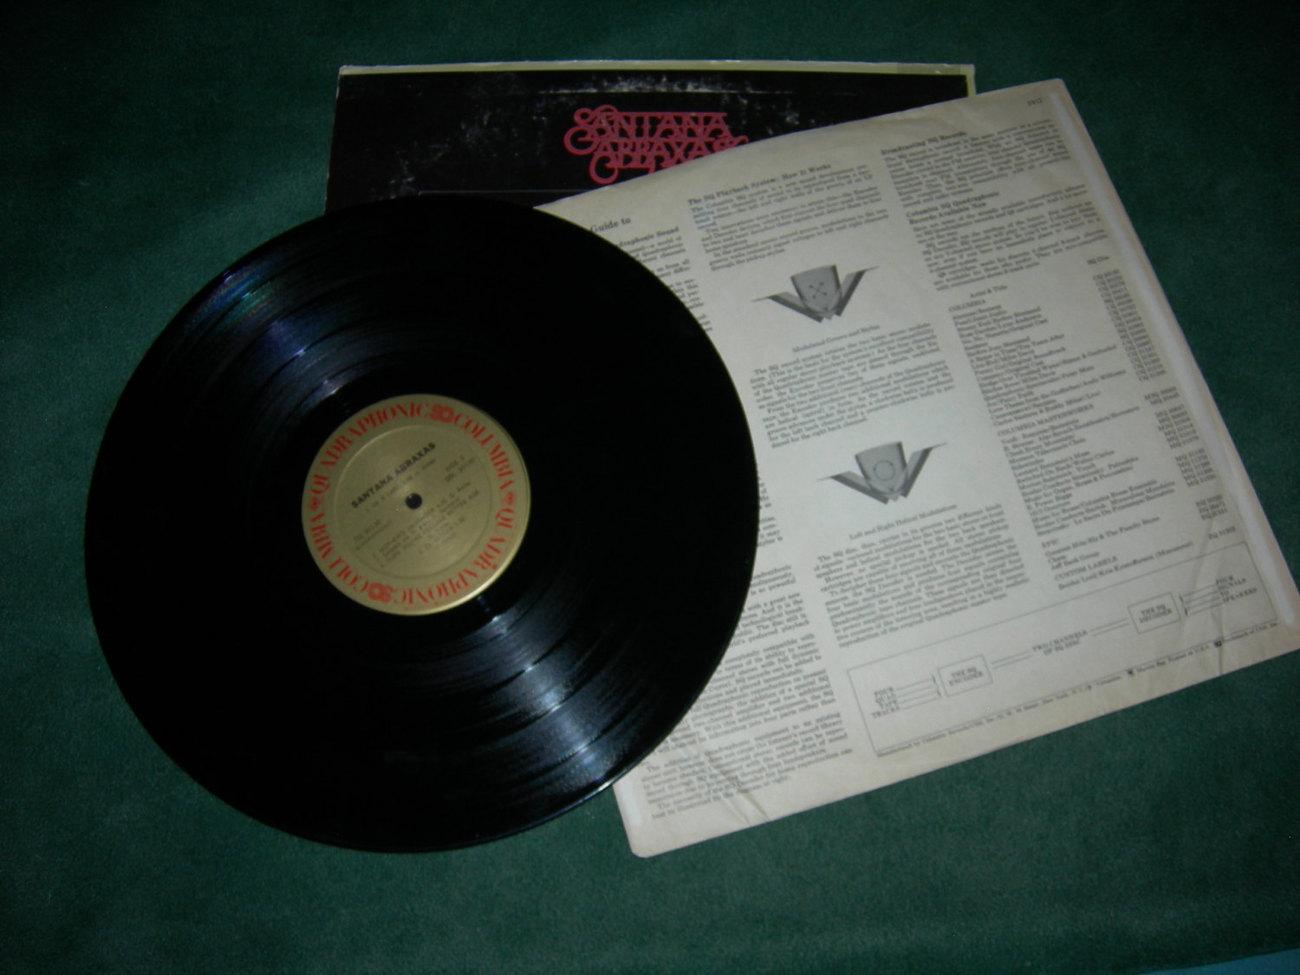 Santana Abraxas Quadraphonic - LP 1970